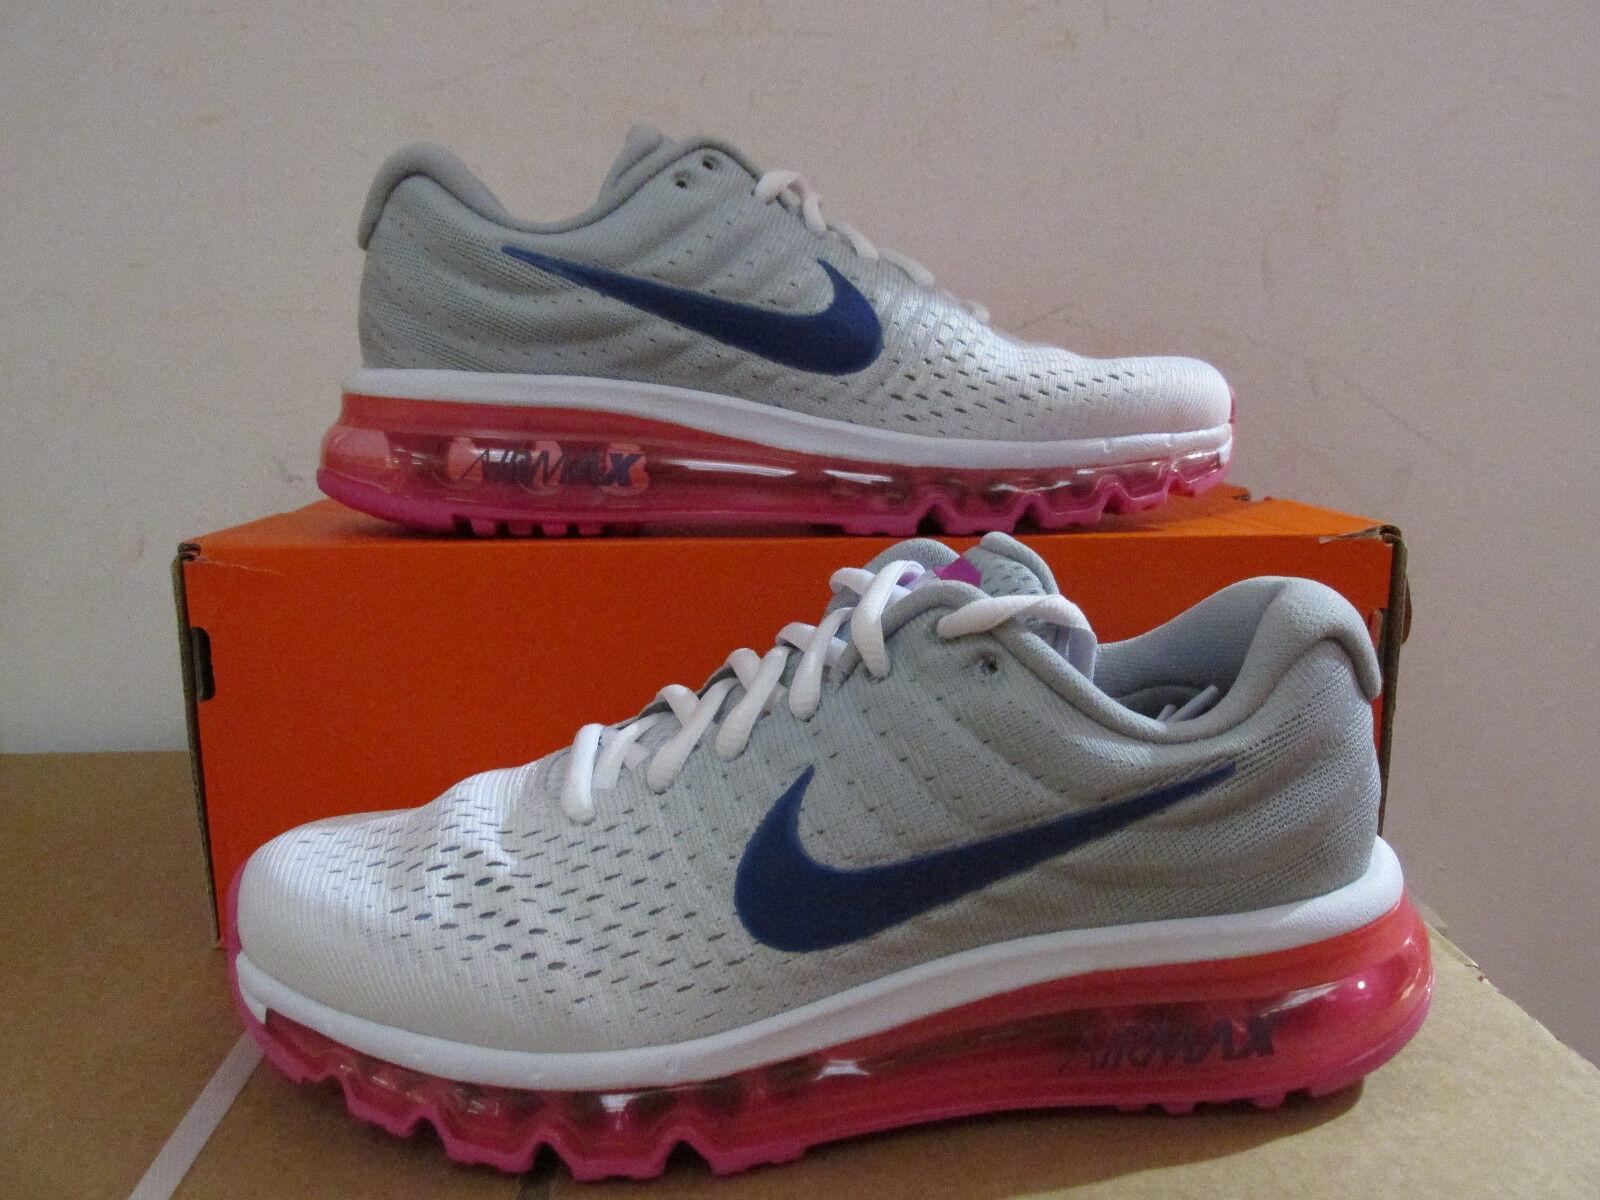 Nike Wo Hommes Air 849560 Max 2018 Running Trainers 849560 Air Baskets Chaussures CLEARANCE e9a808